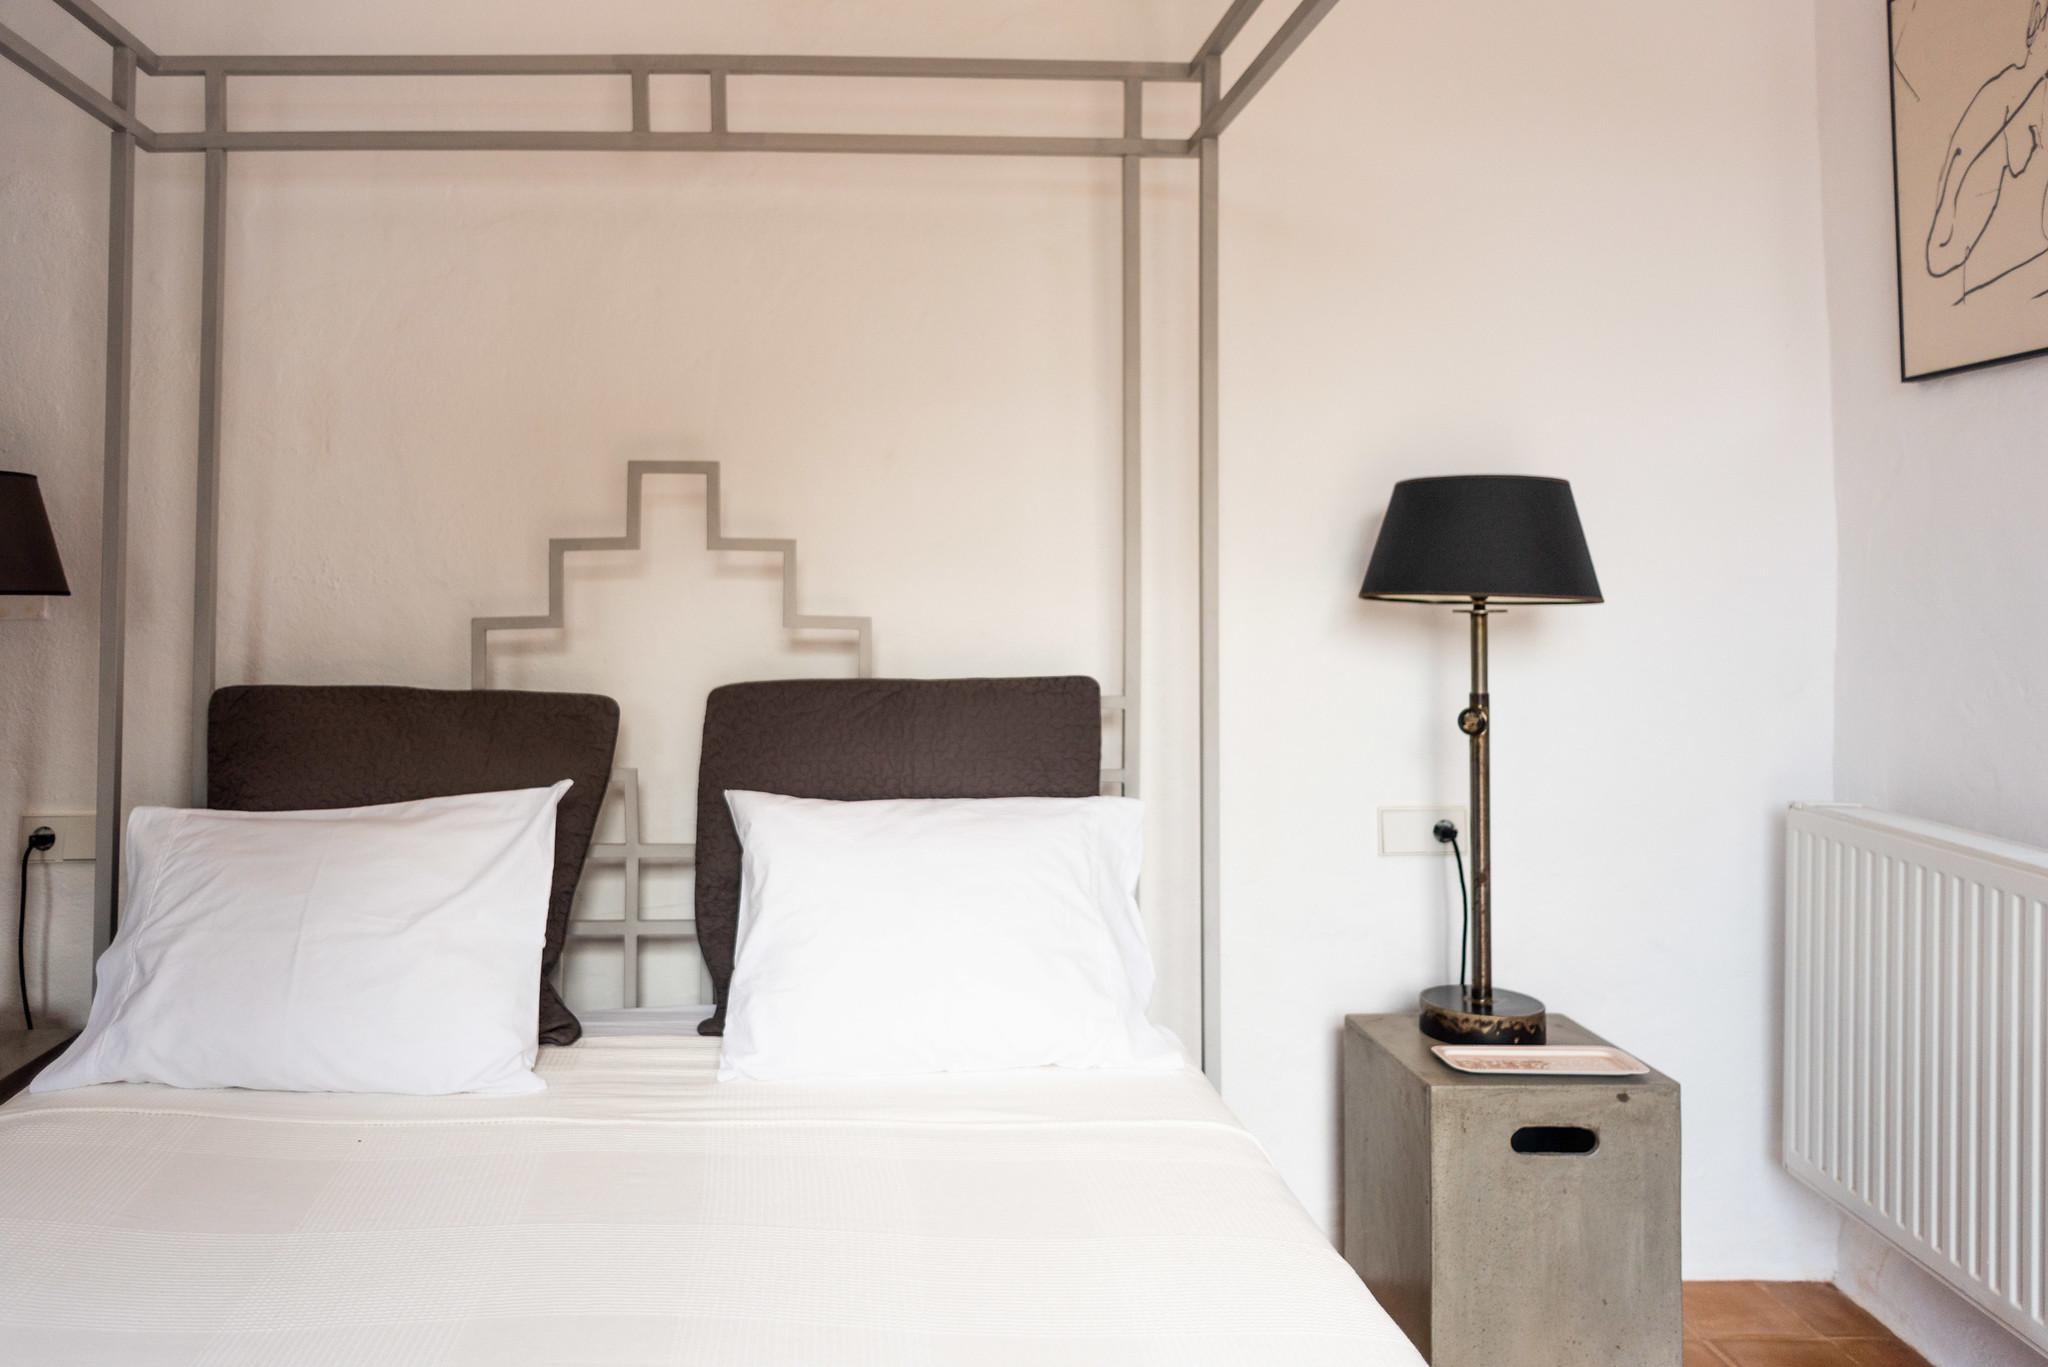 https://www.white-ibiza.com/wp-content/uploads/2020/05/white-ibiza-villas-can-lyra-interior-bedroom.jpg